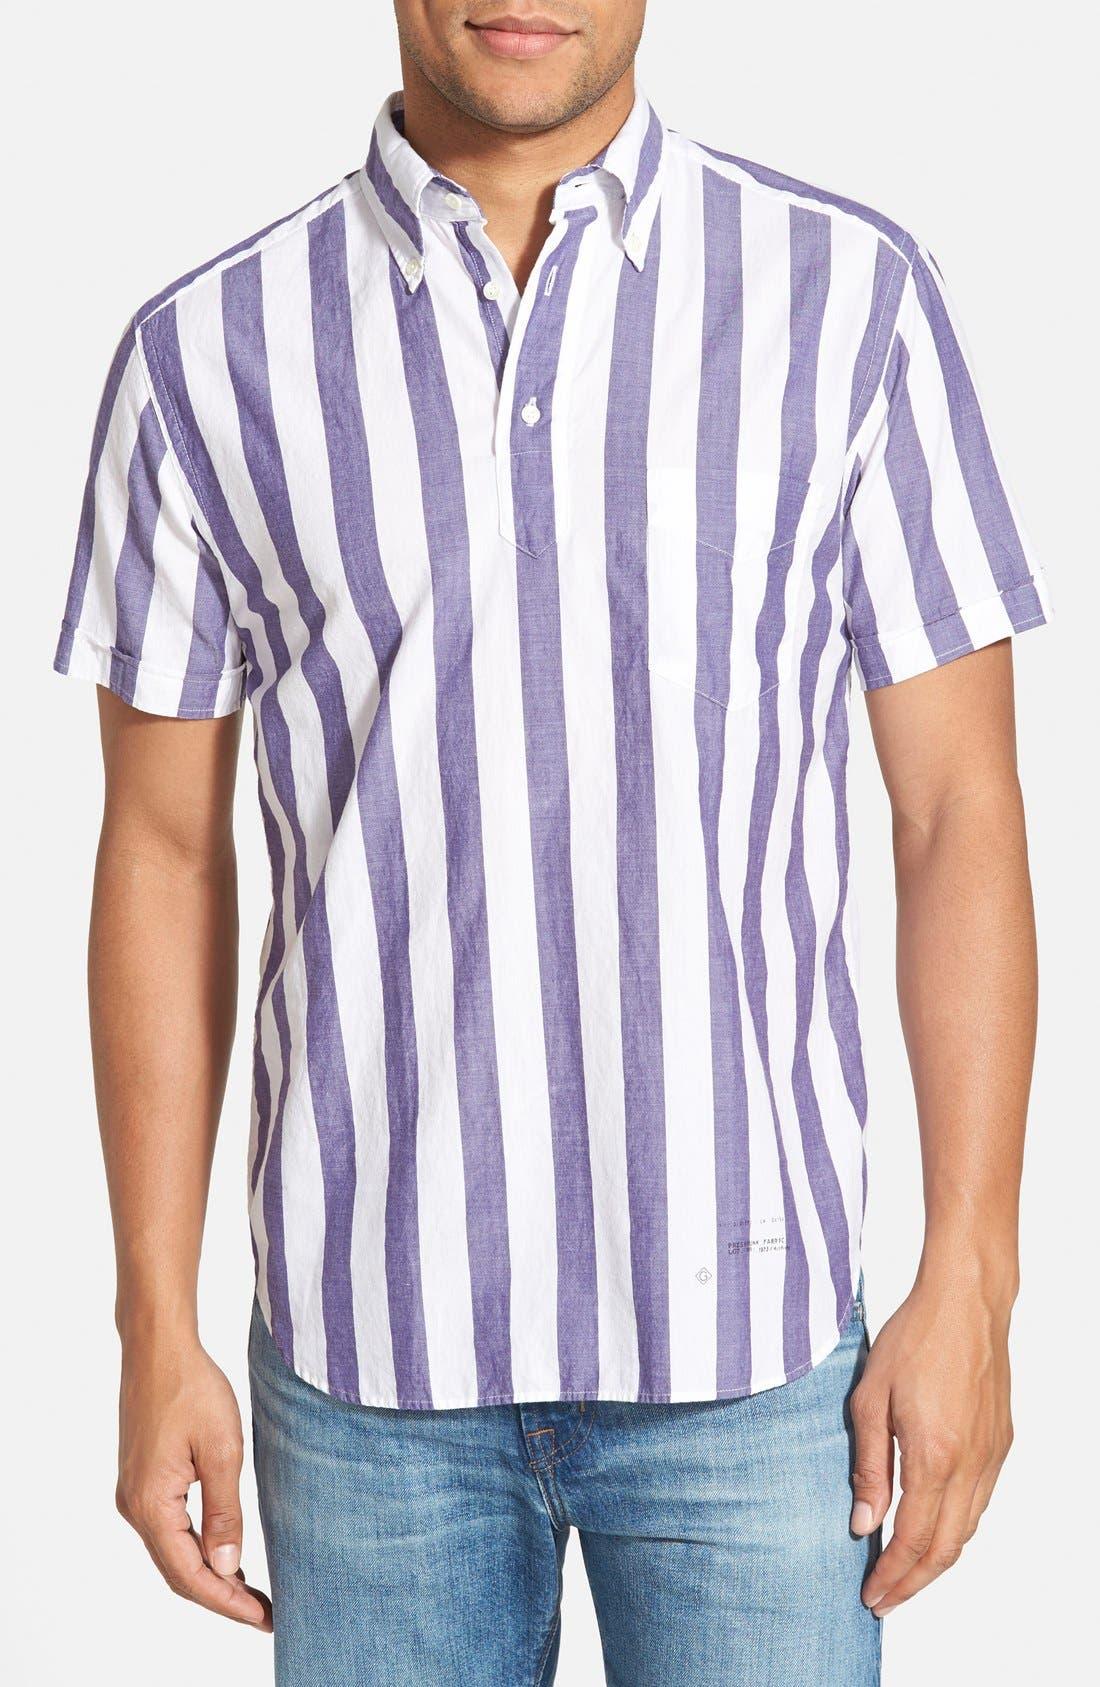 GANT RUGGER, E-Z Fit Madras Stripe Woven Pullover Shirt, Main thumbnail 1, color, 436